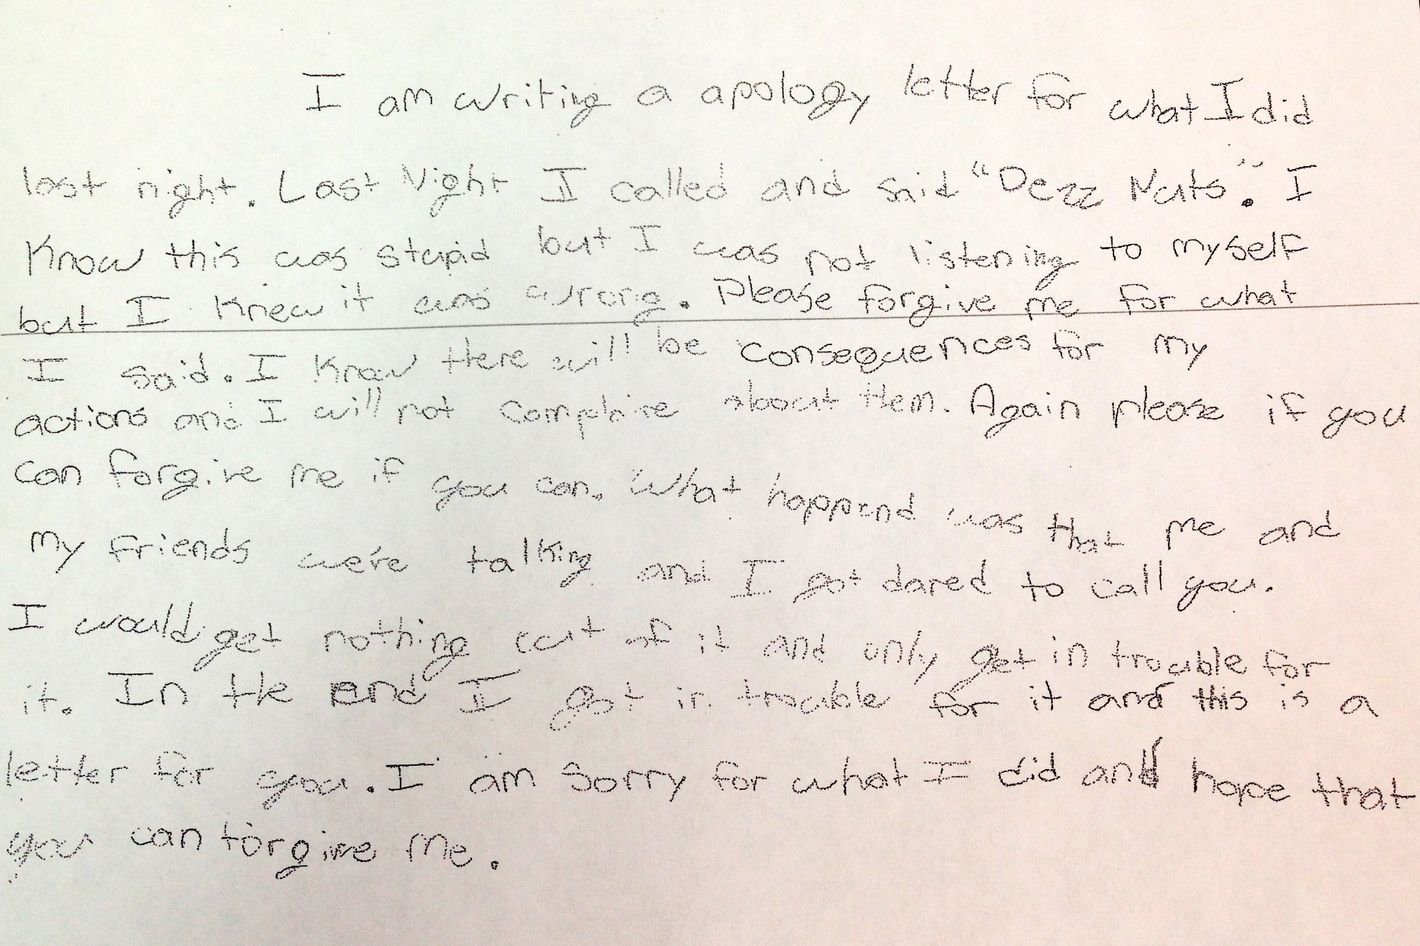 Nice Probe Apology Email Image Collection - FORTSETZUNG ARBEITSBLATT ...